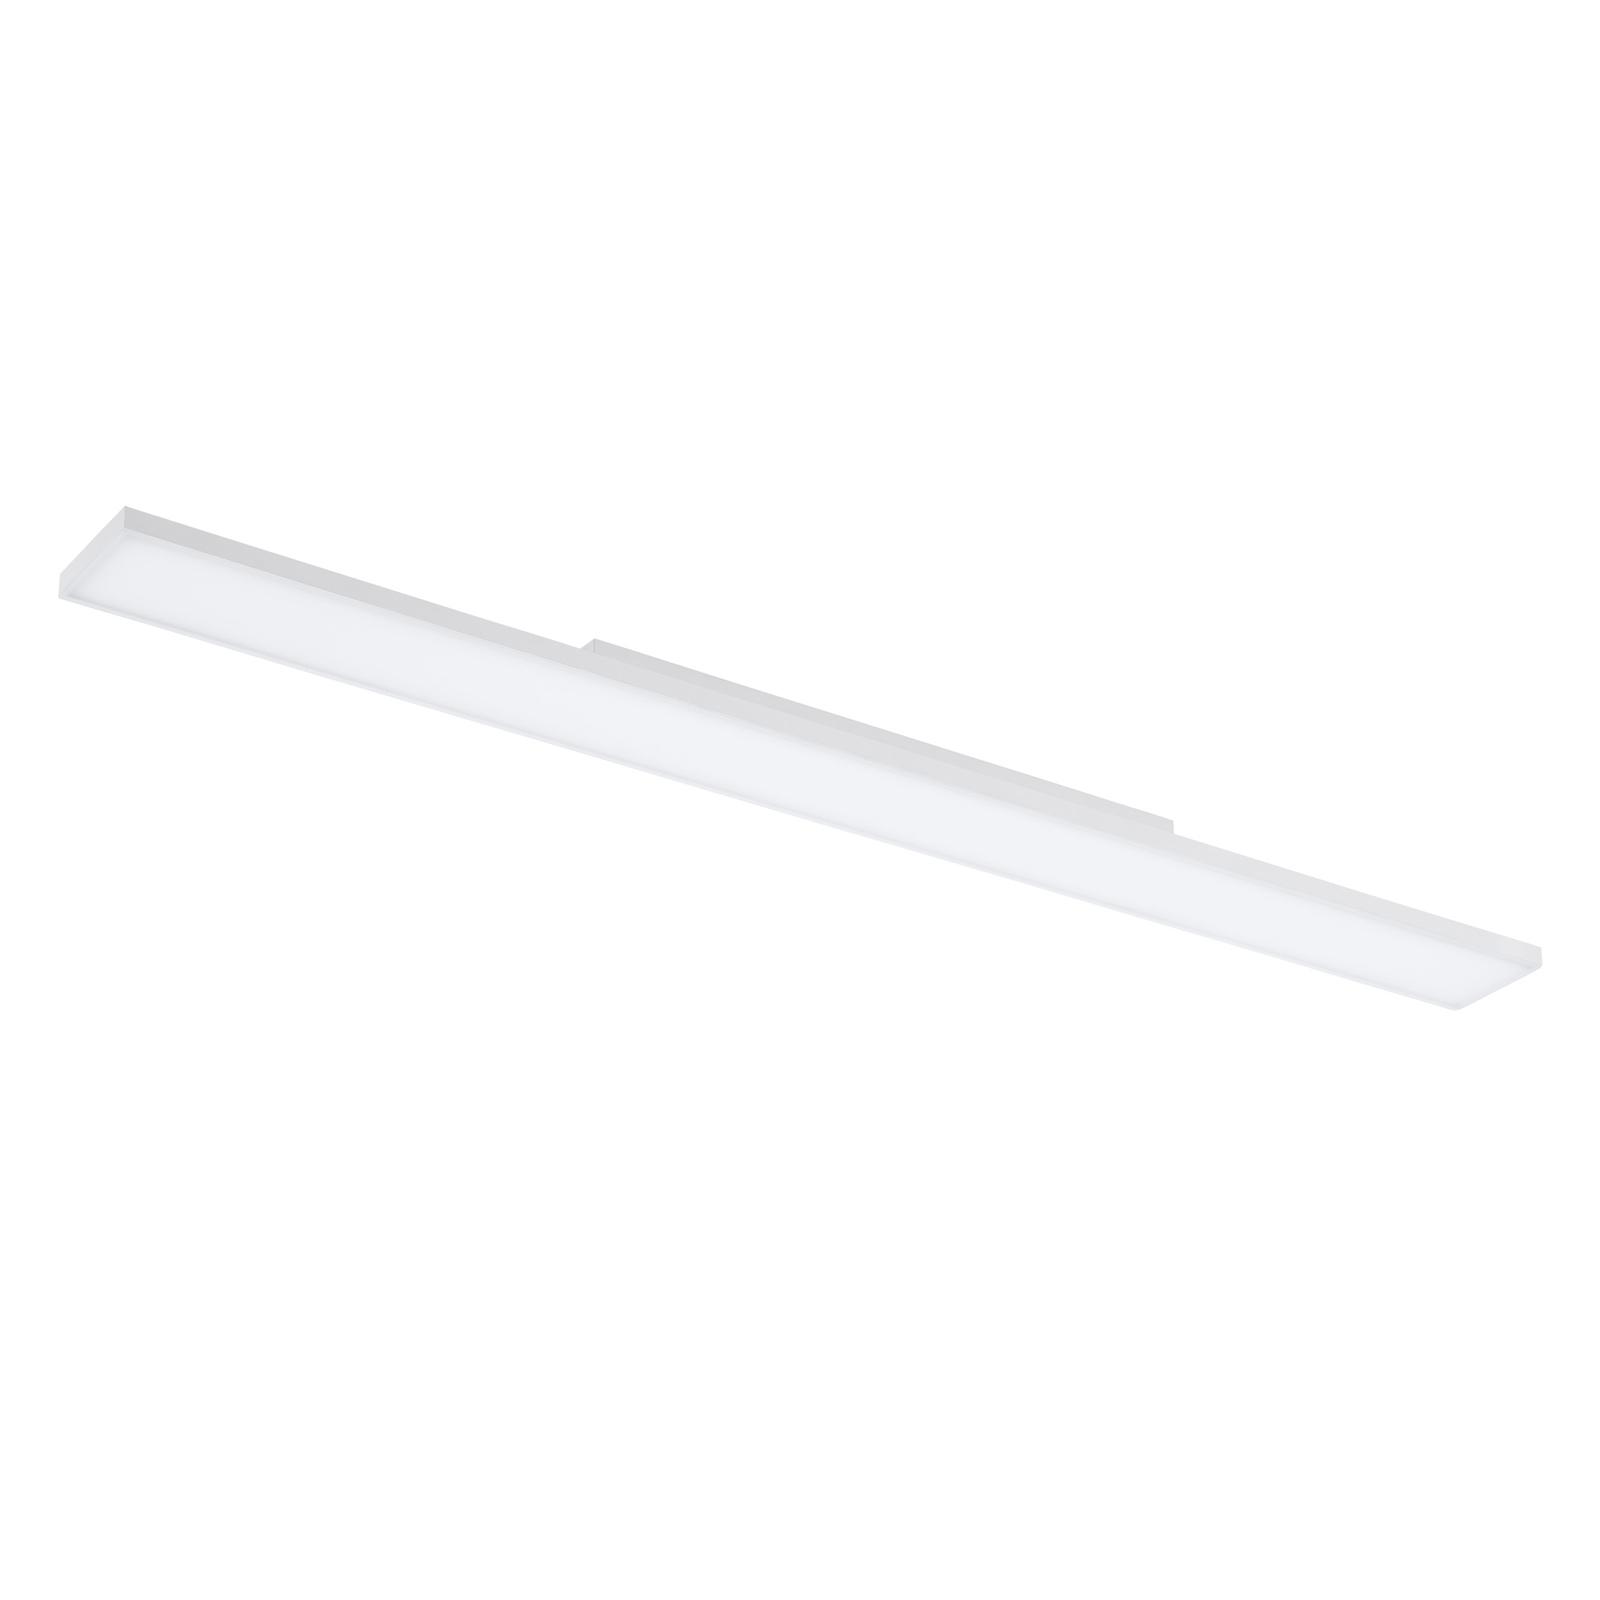 LED-taklampe Turcona 120 x 10 cm